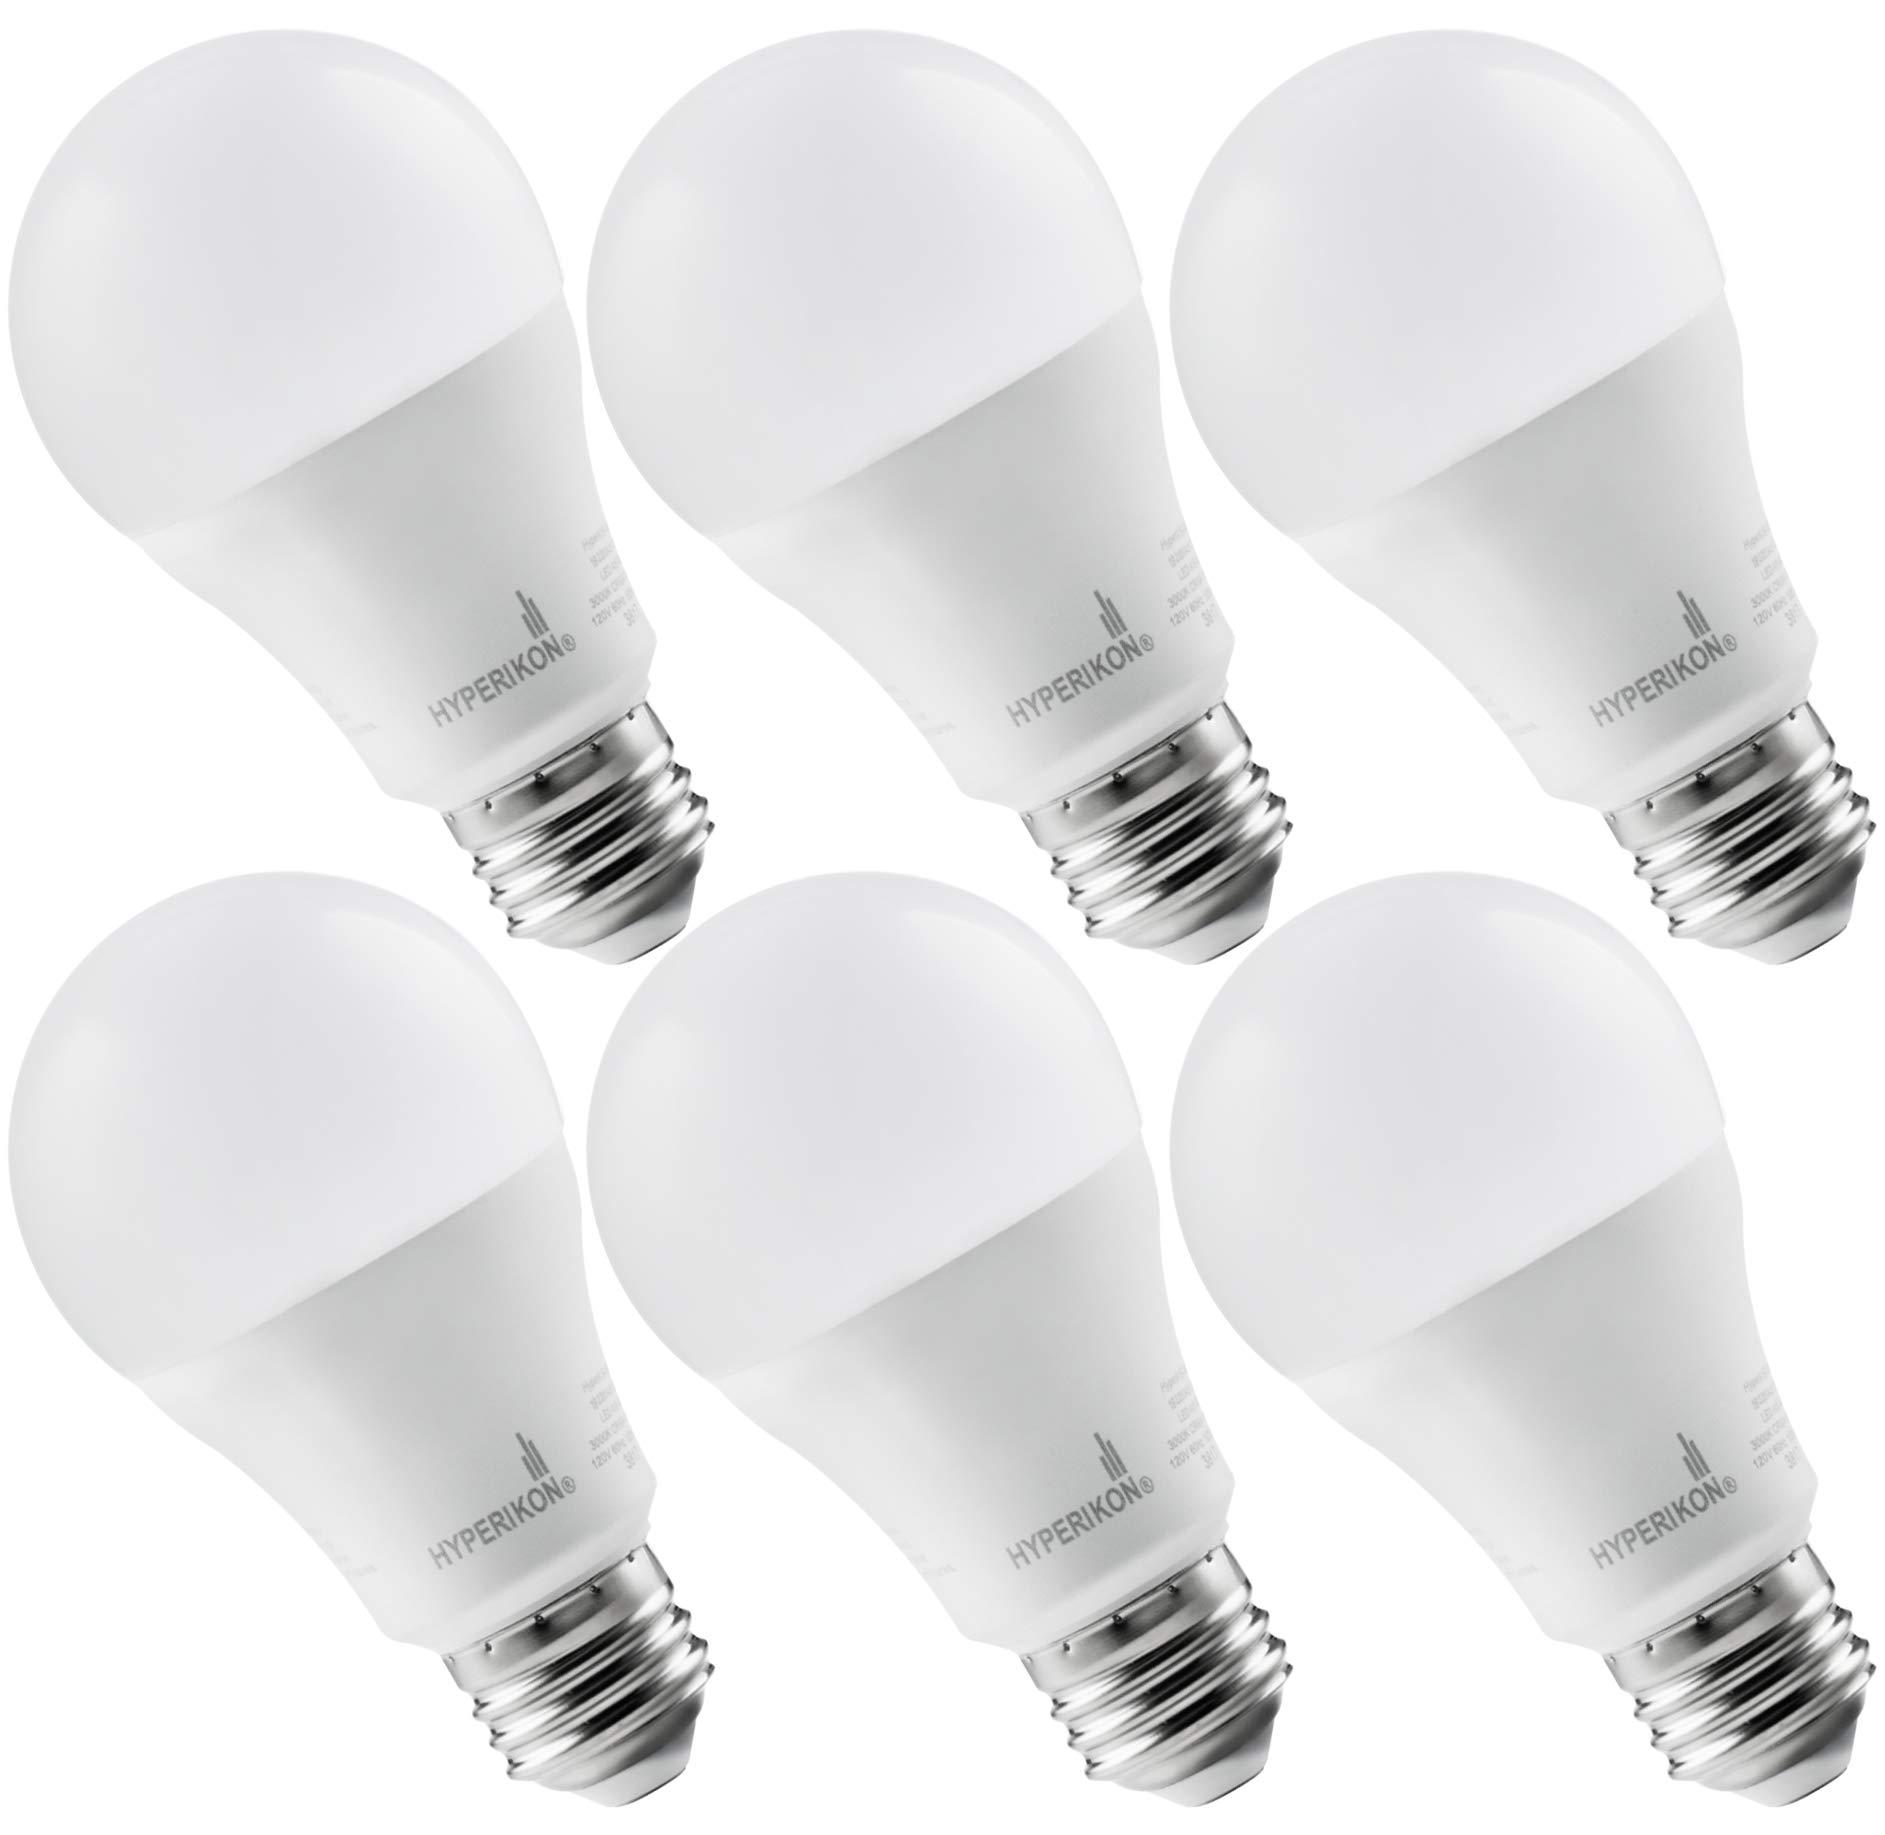 Hyperikon LED A19 Dimmable Bulb 100W Equivalent, Soft White 3000K, LED 14W Bulb (6 Pack)